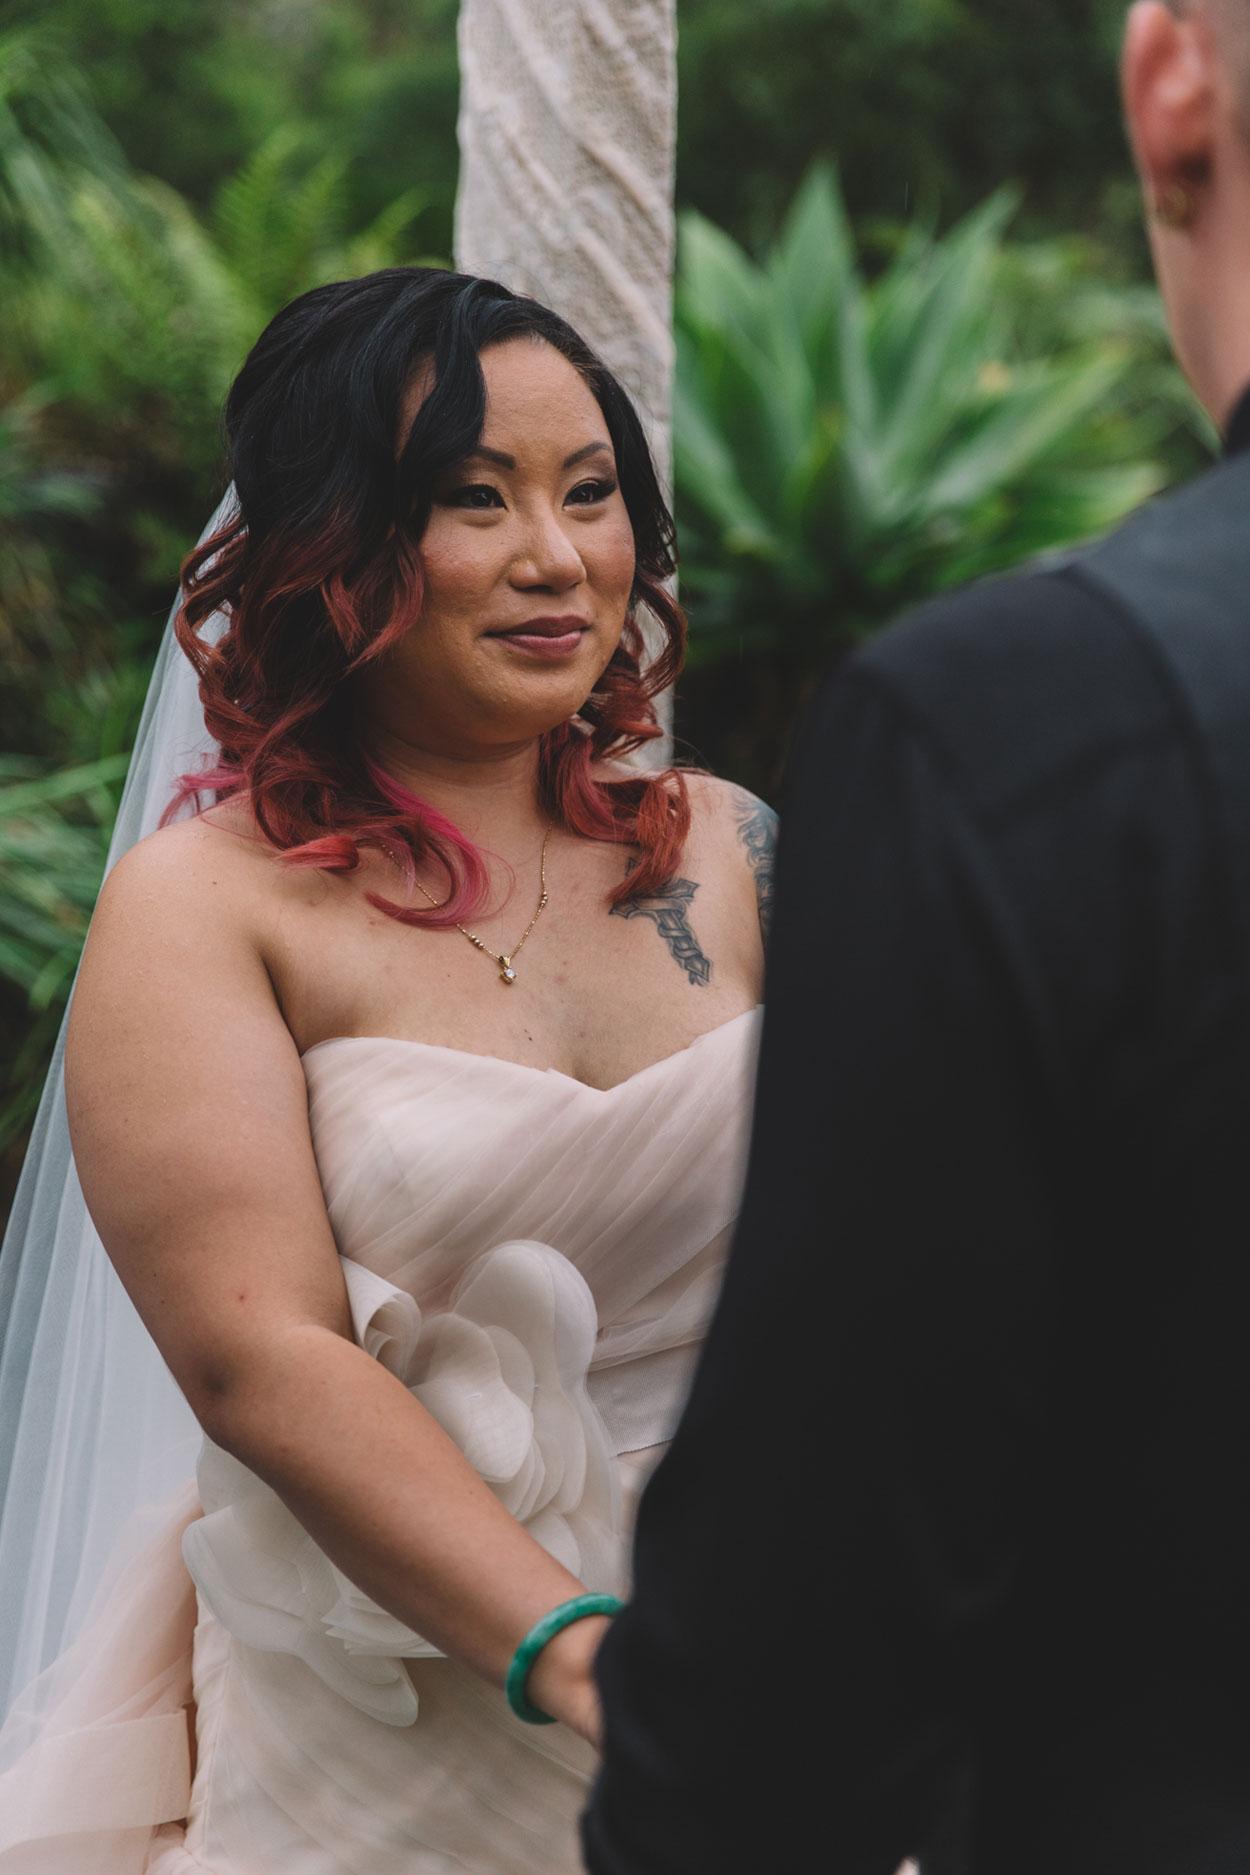 Best Eco Australian International Pre Wedding Destination Photographers - Sunshine Coast, Brisbane, Noosa Elopement Photography Packages